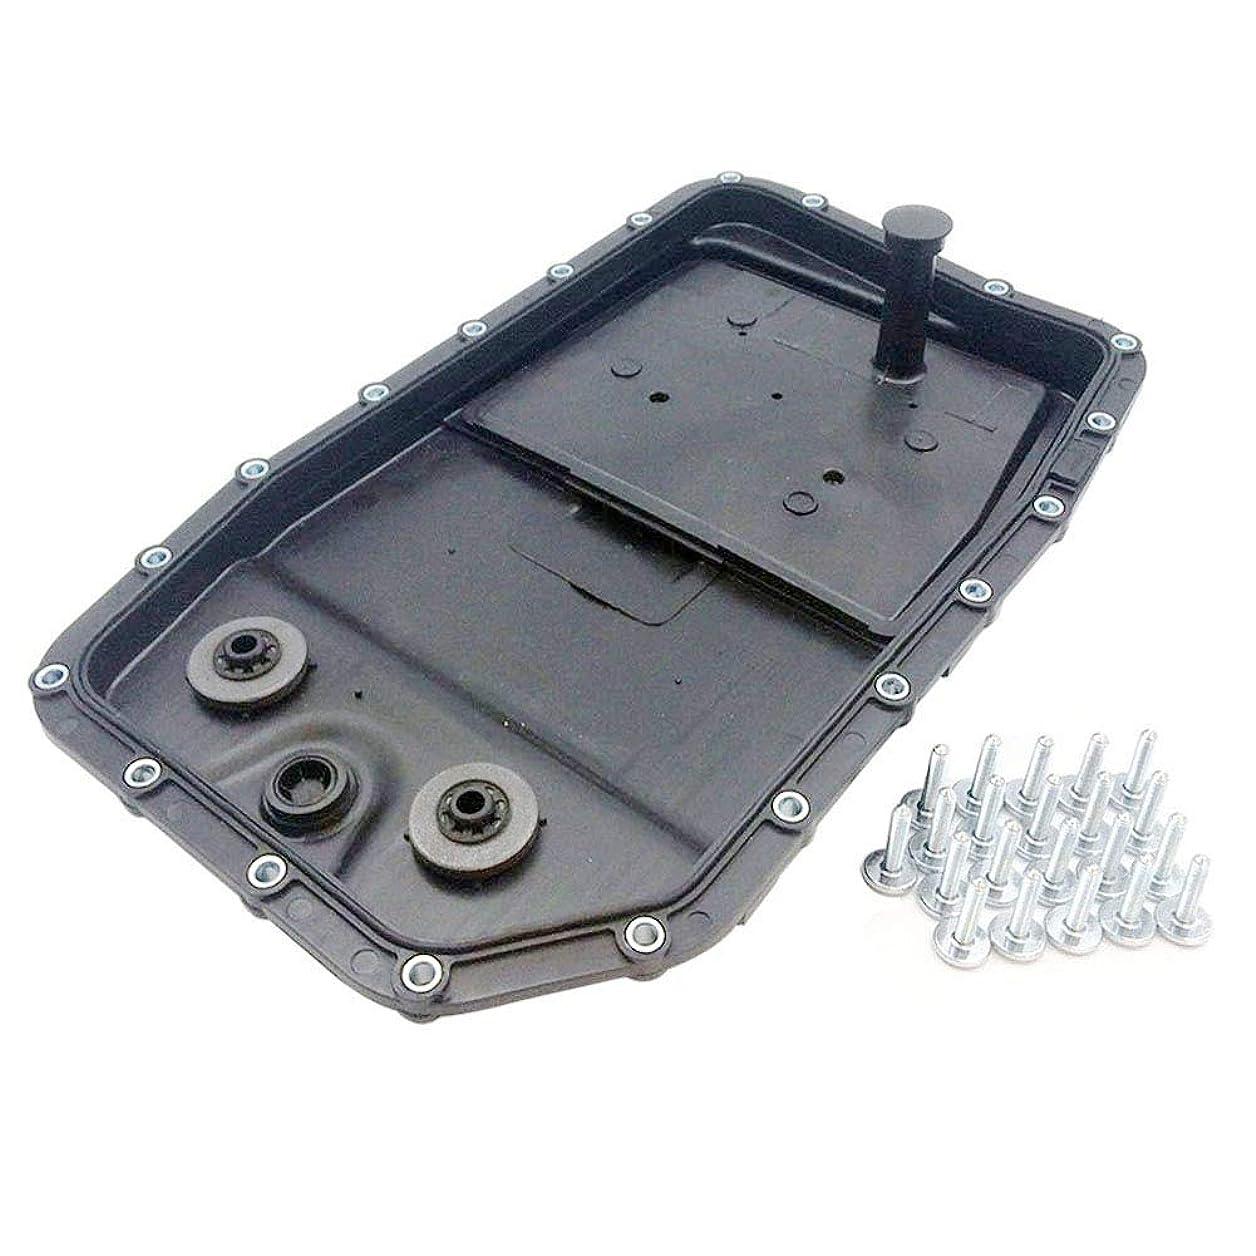 Auto Transmission Oil Pan w Filter Gasket and Bolts for Land Rover Jaguar OE Ref# LR007474 oglpuzwhdkhryjcp